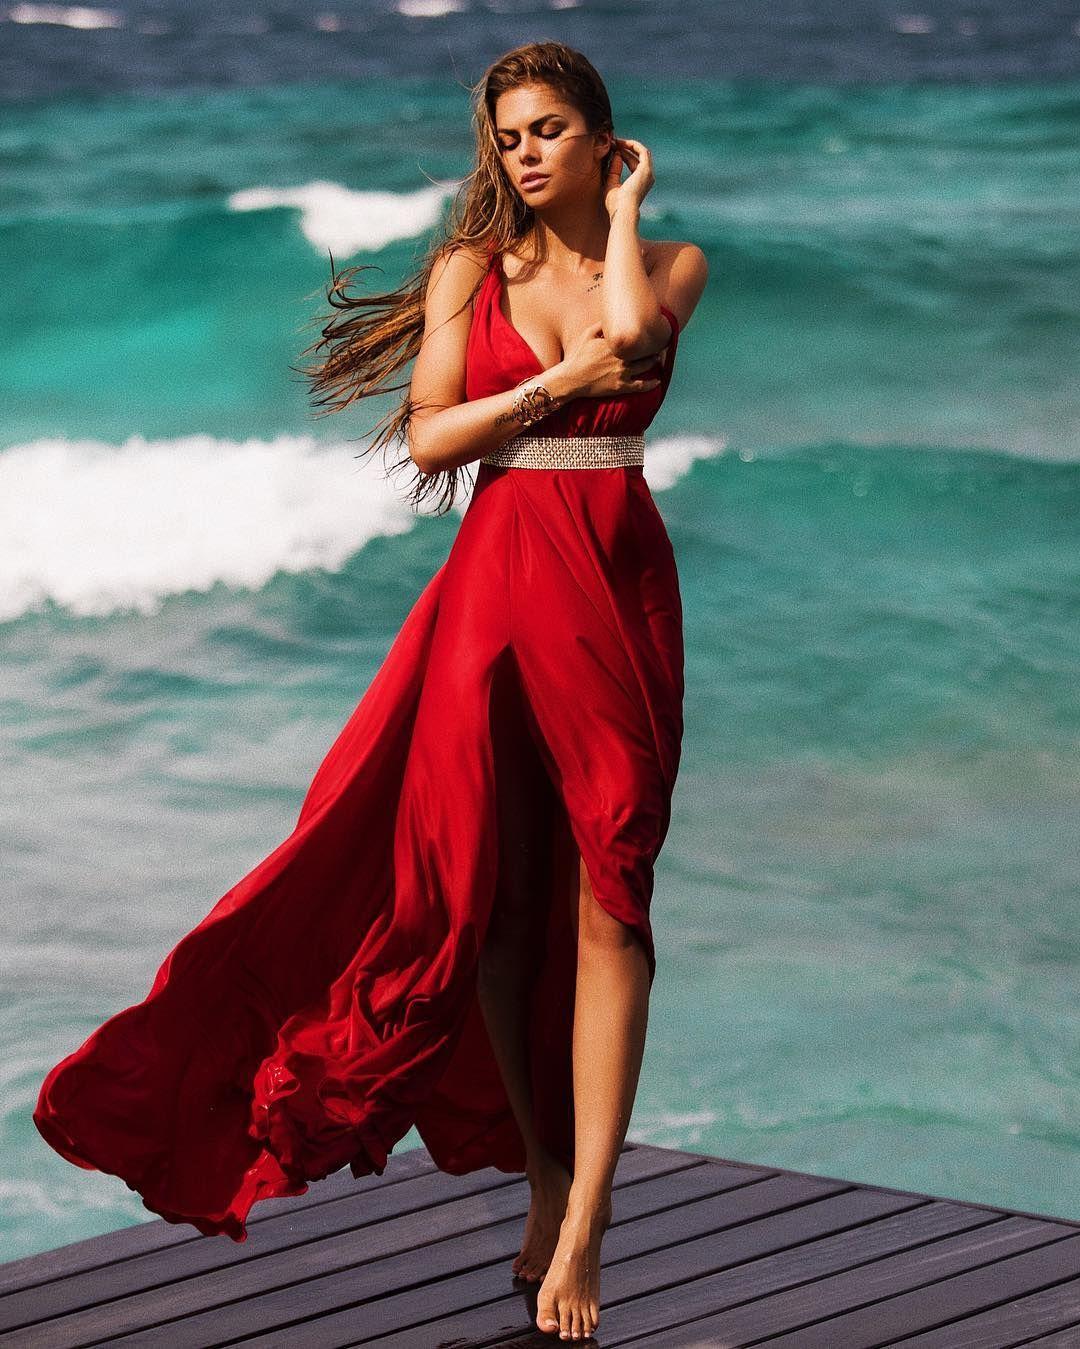 Sexy latina women modeling